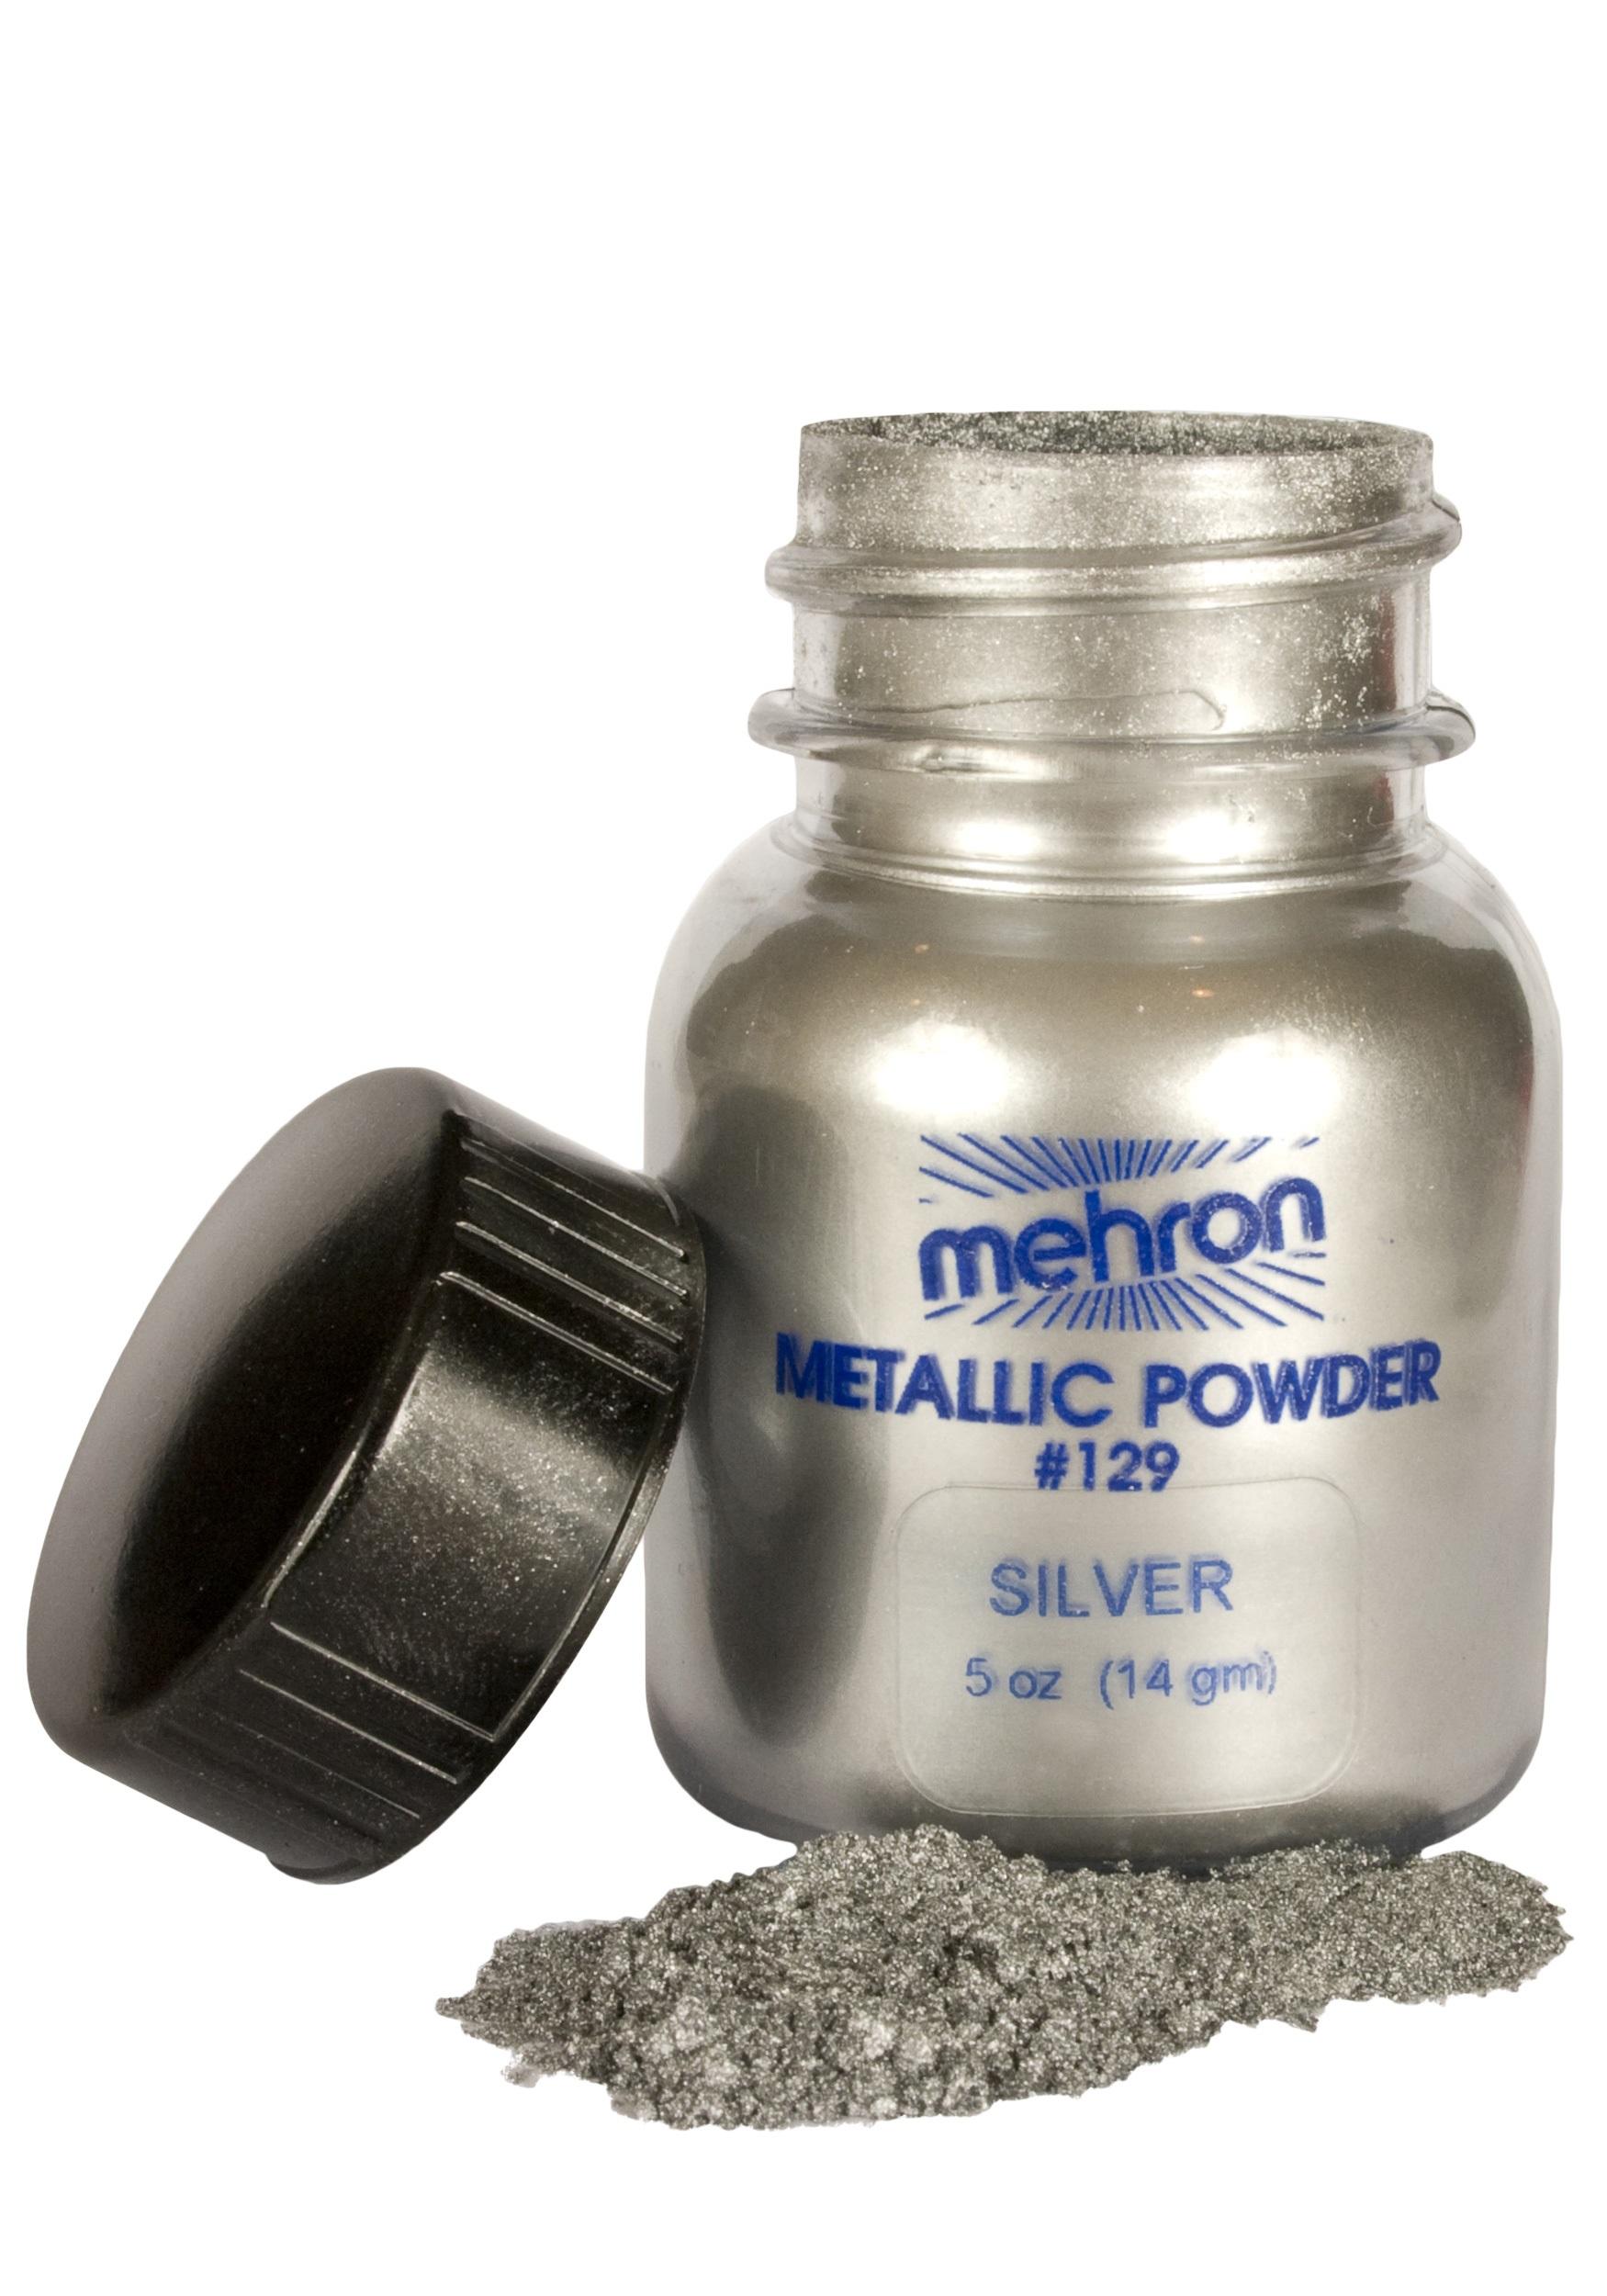 Mehron Silver Metallic Powder Makeup